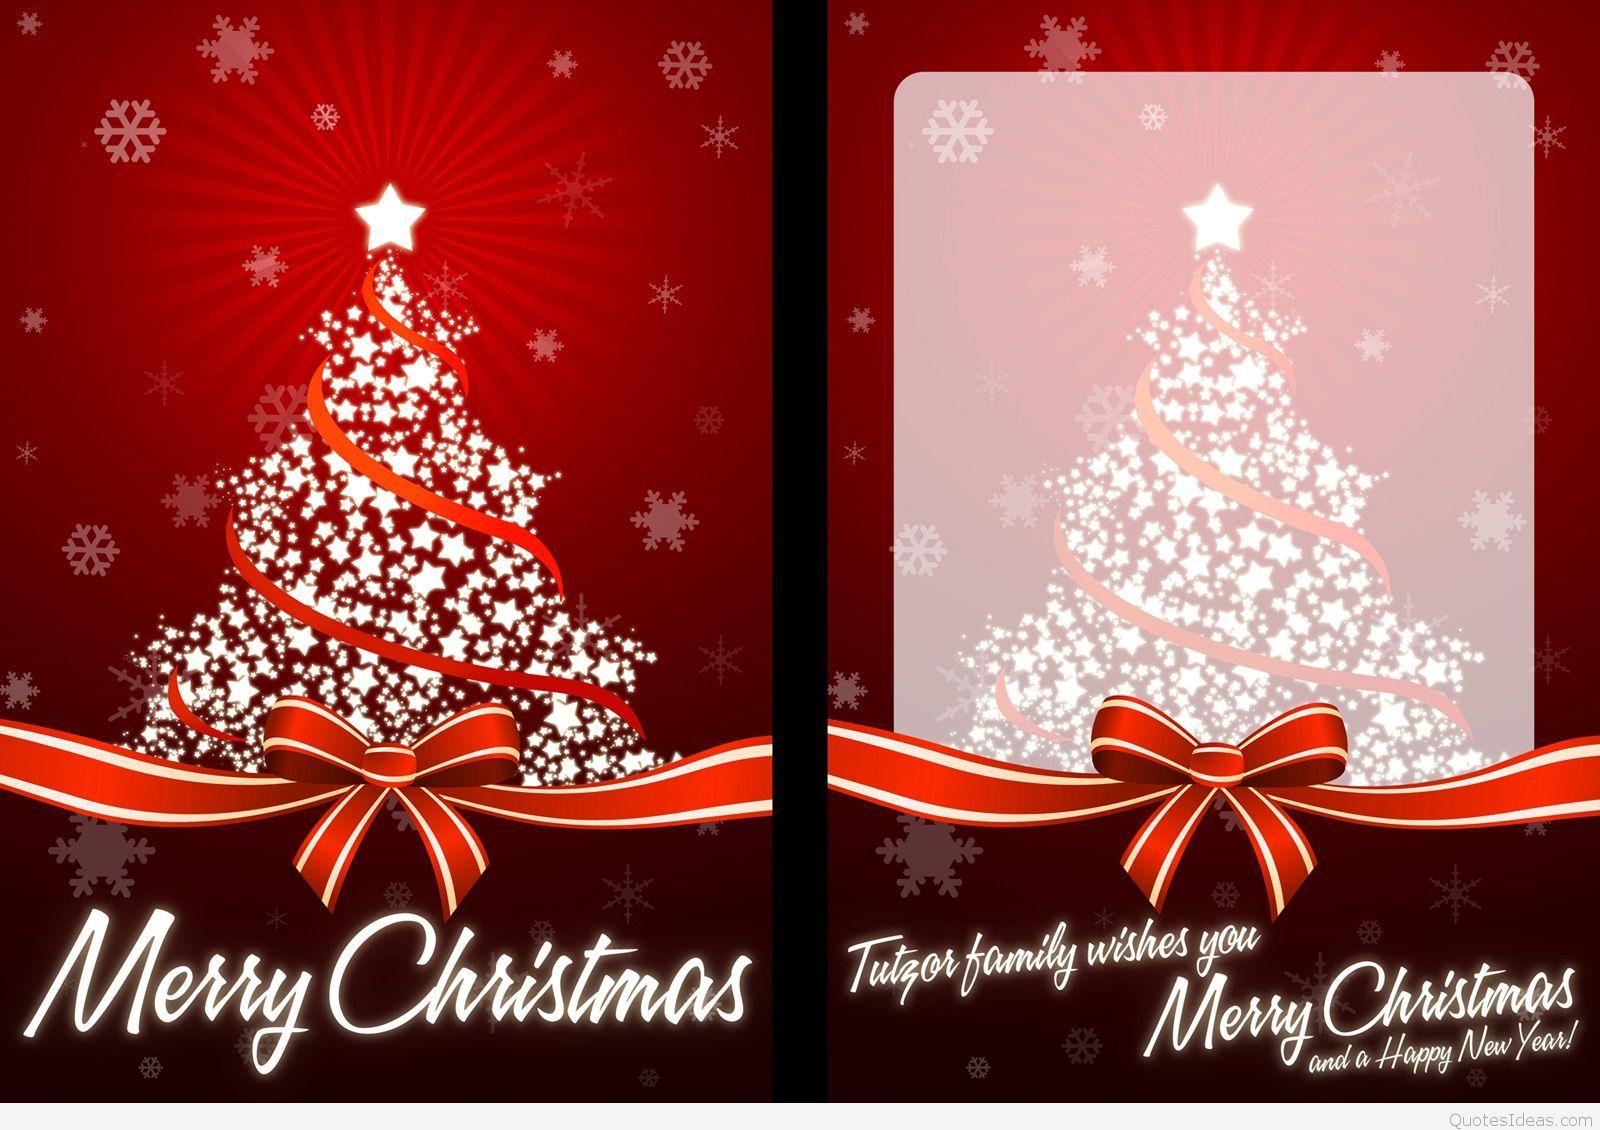 Merry Christmas Greeting Cards 2018 Christmas card